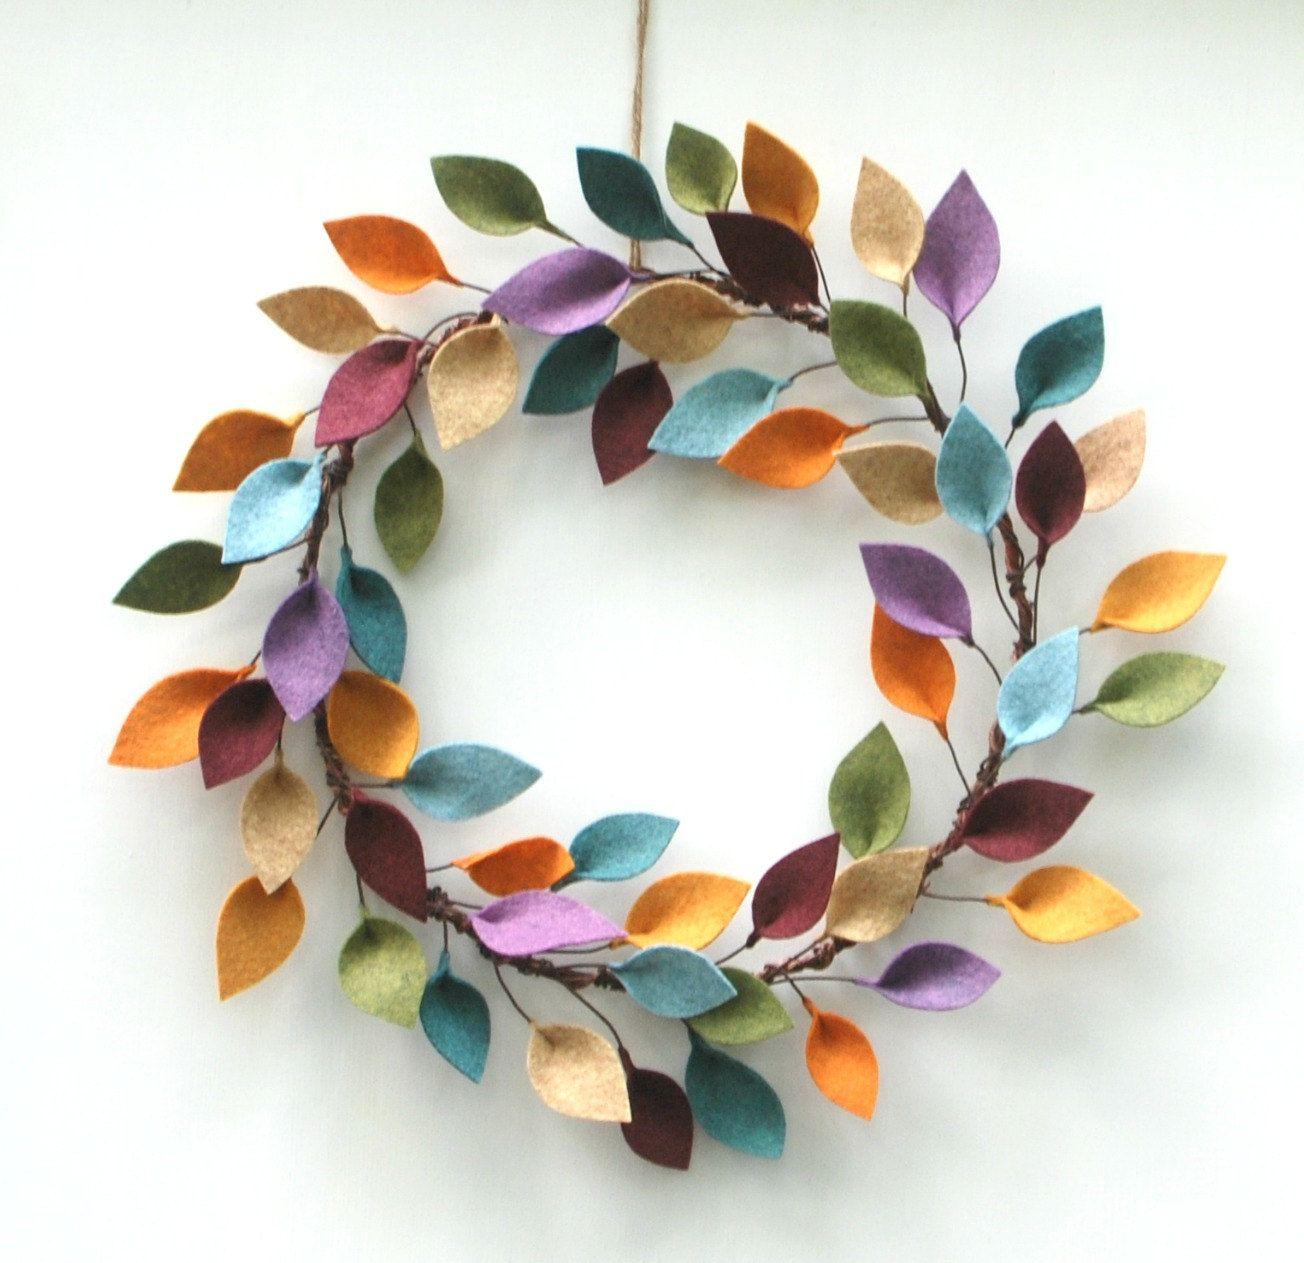 Minimalist Fall Wreath - Autumn Wool Felt Leaf Wreath - 16 Outside Diameter - As Seen in HGTV Magazine - Made to Order #fallbeauty